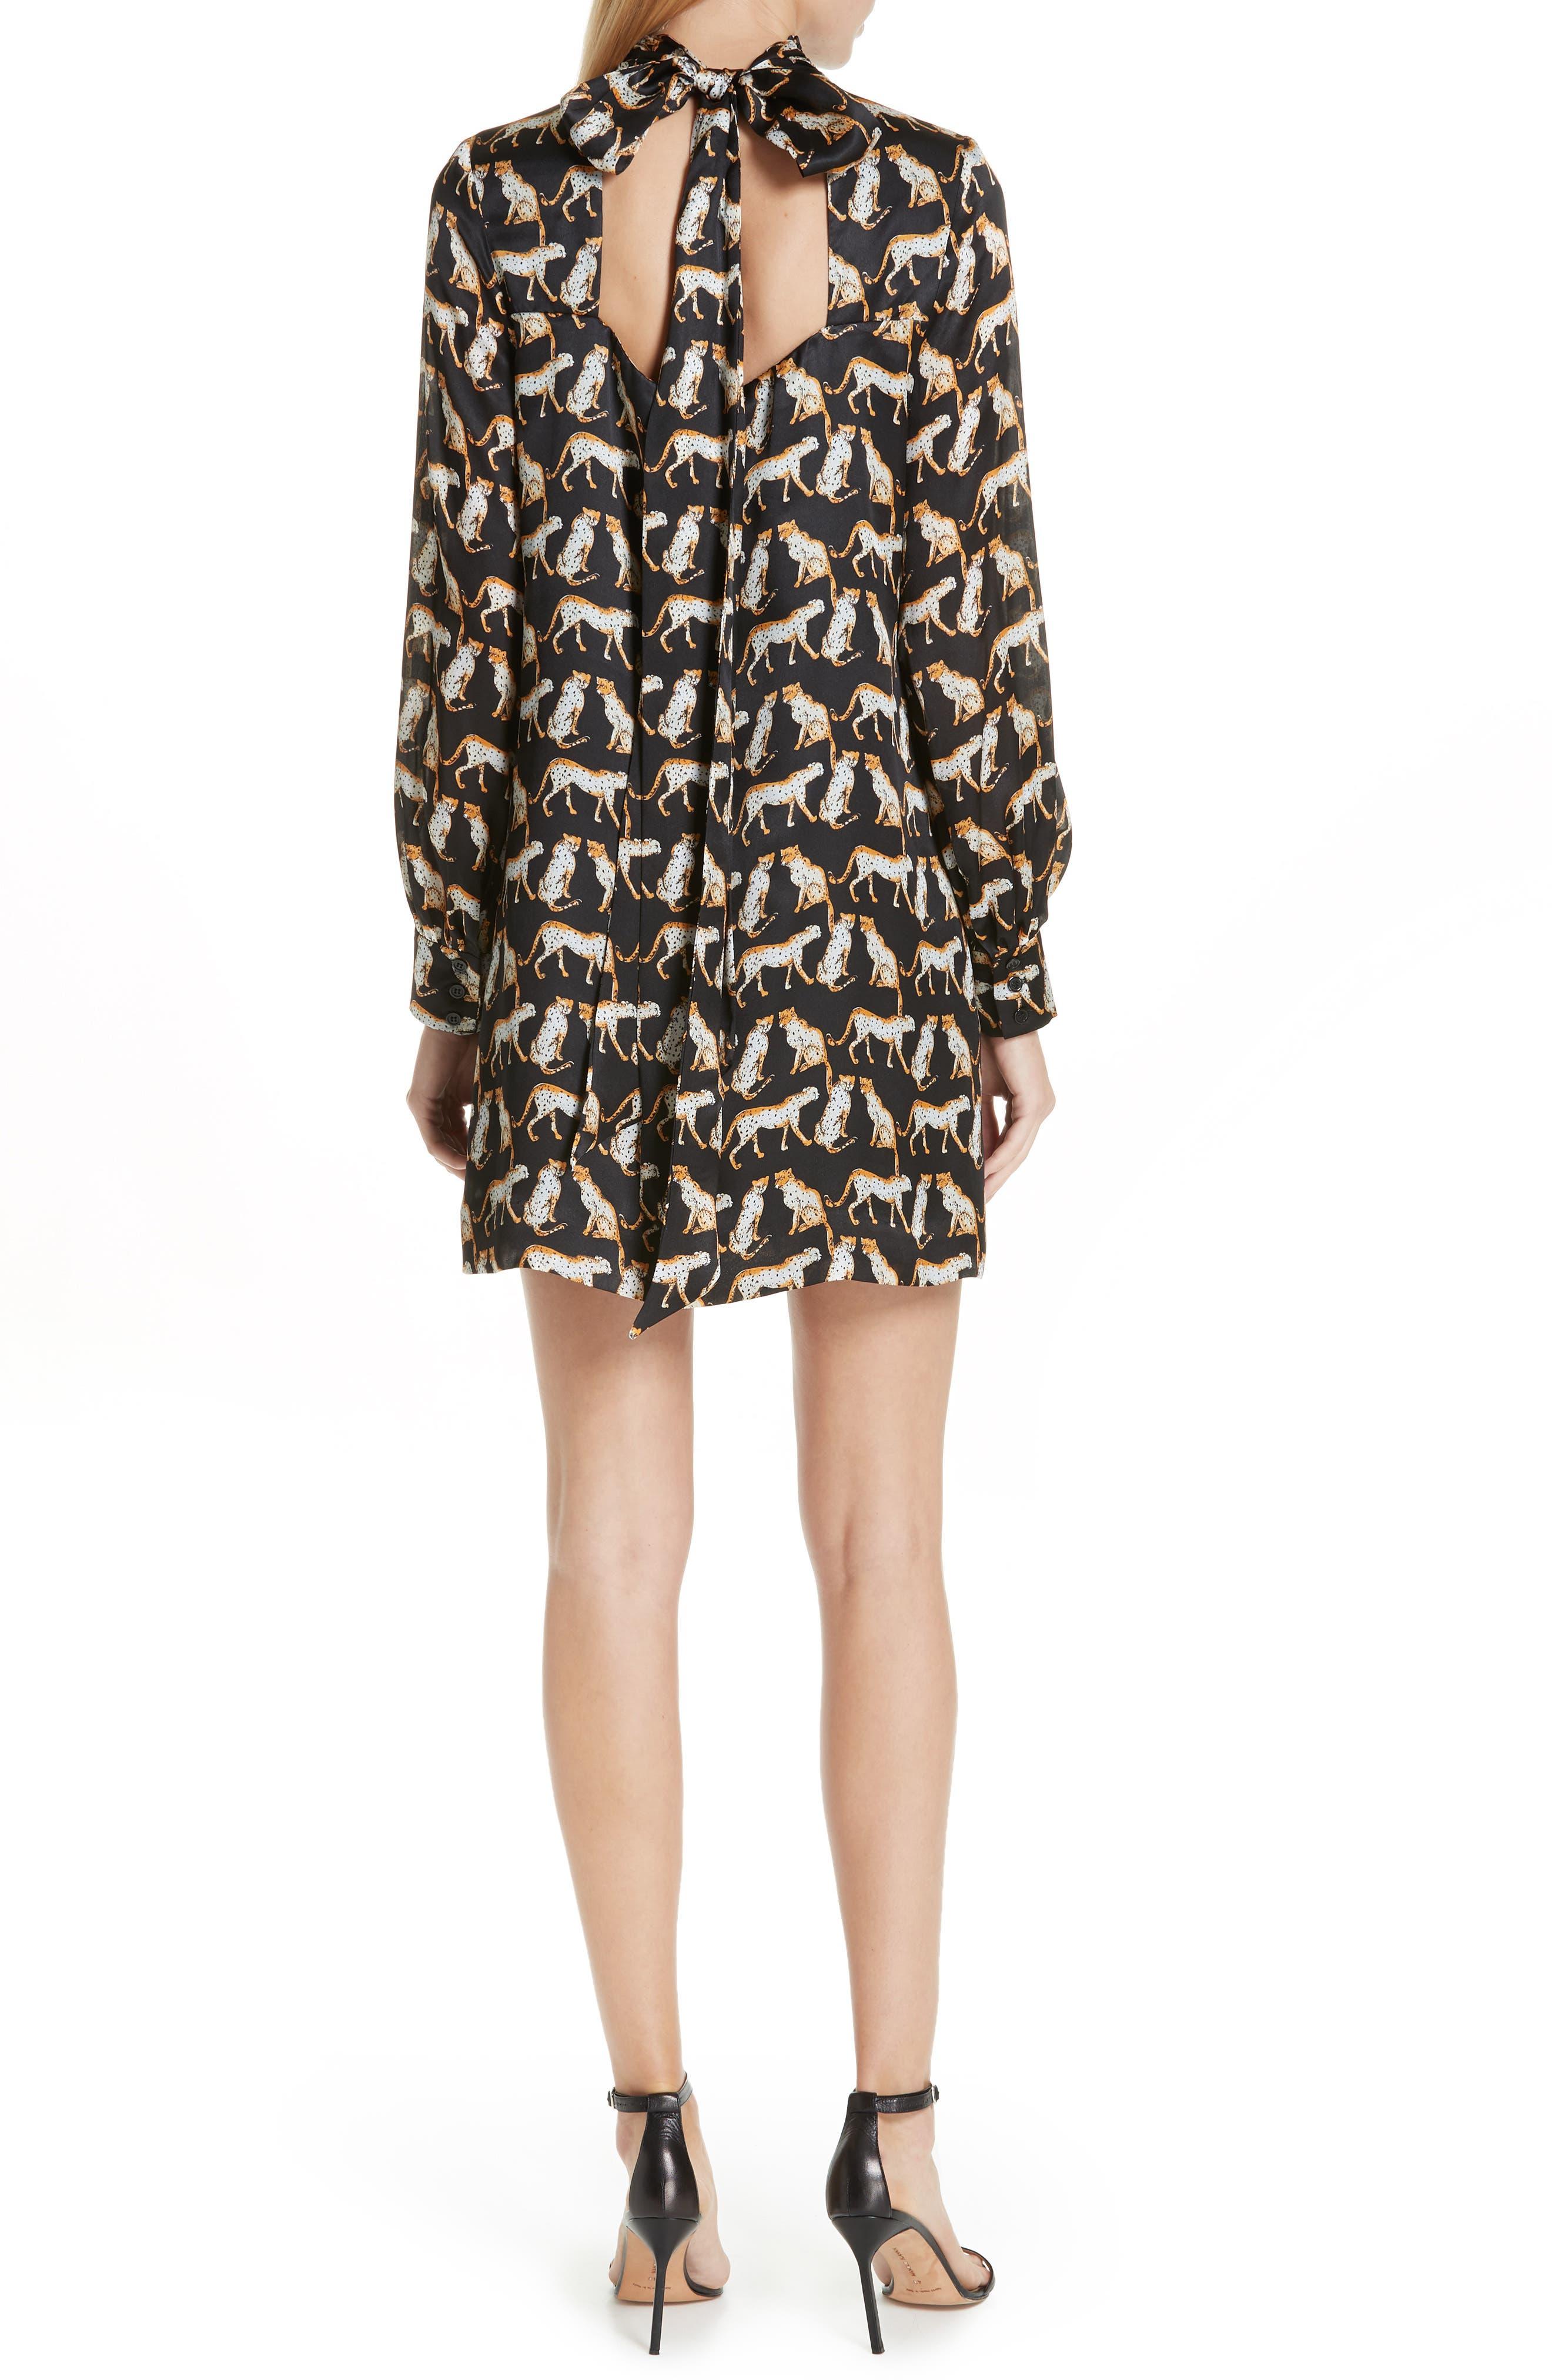 MILLY,                             Cheetah Print High Neck Silk Dress,                             Alternate thumbnail 2, color,                             001